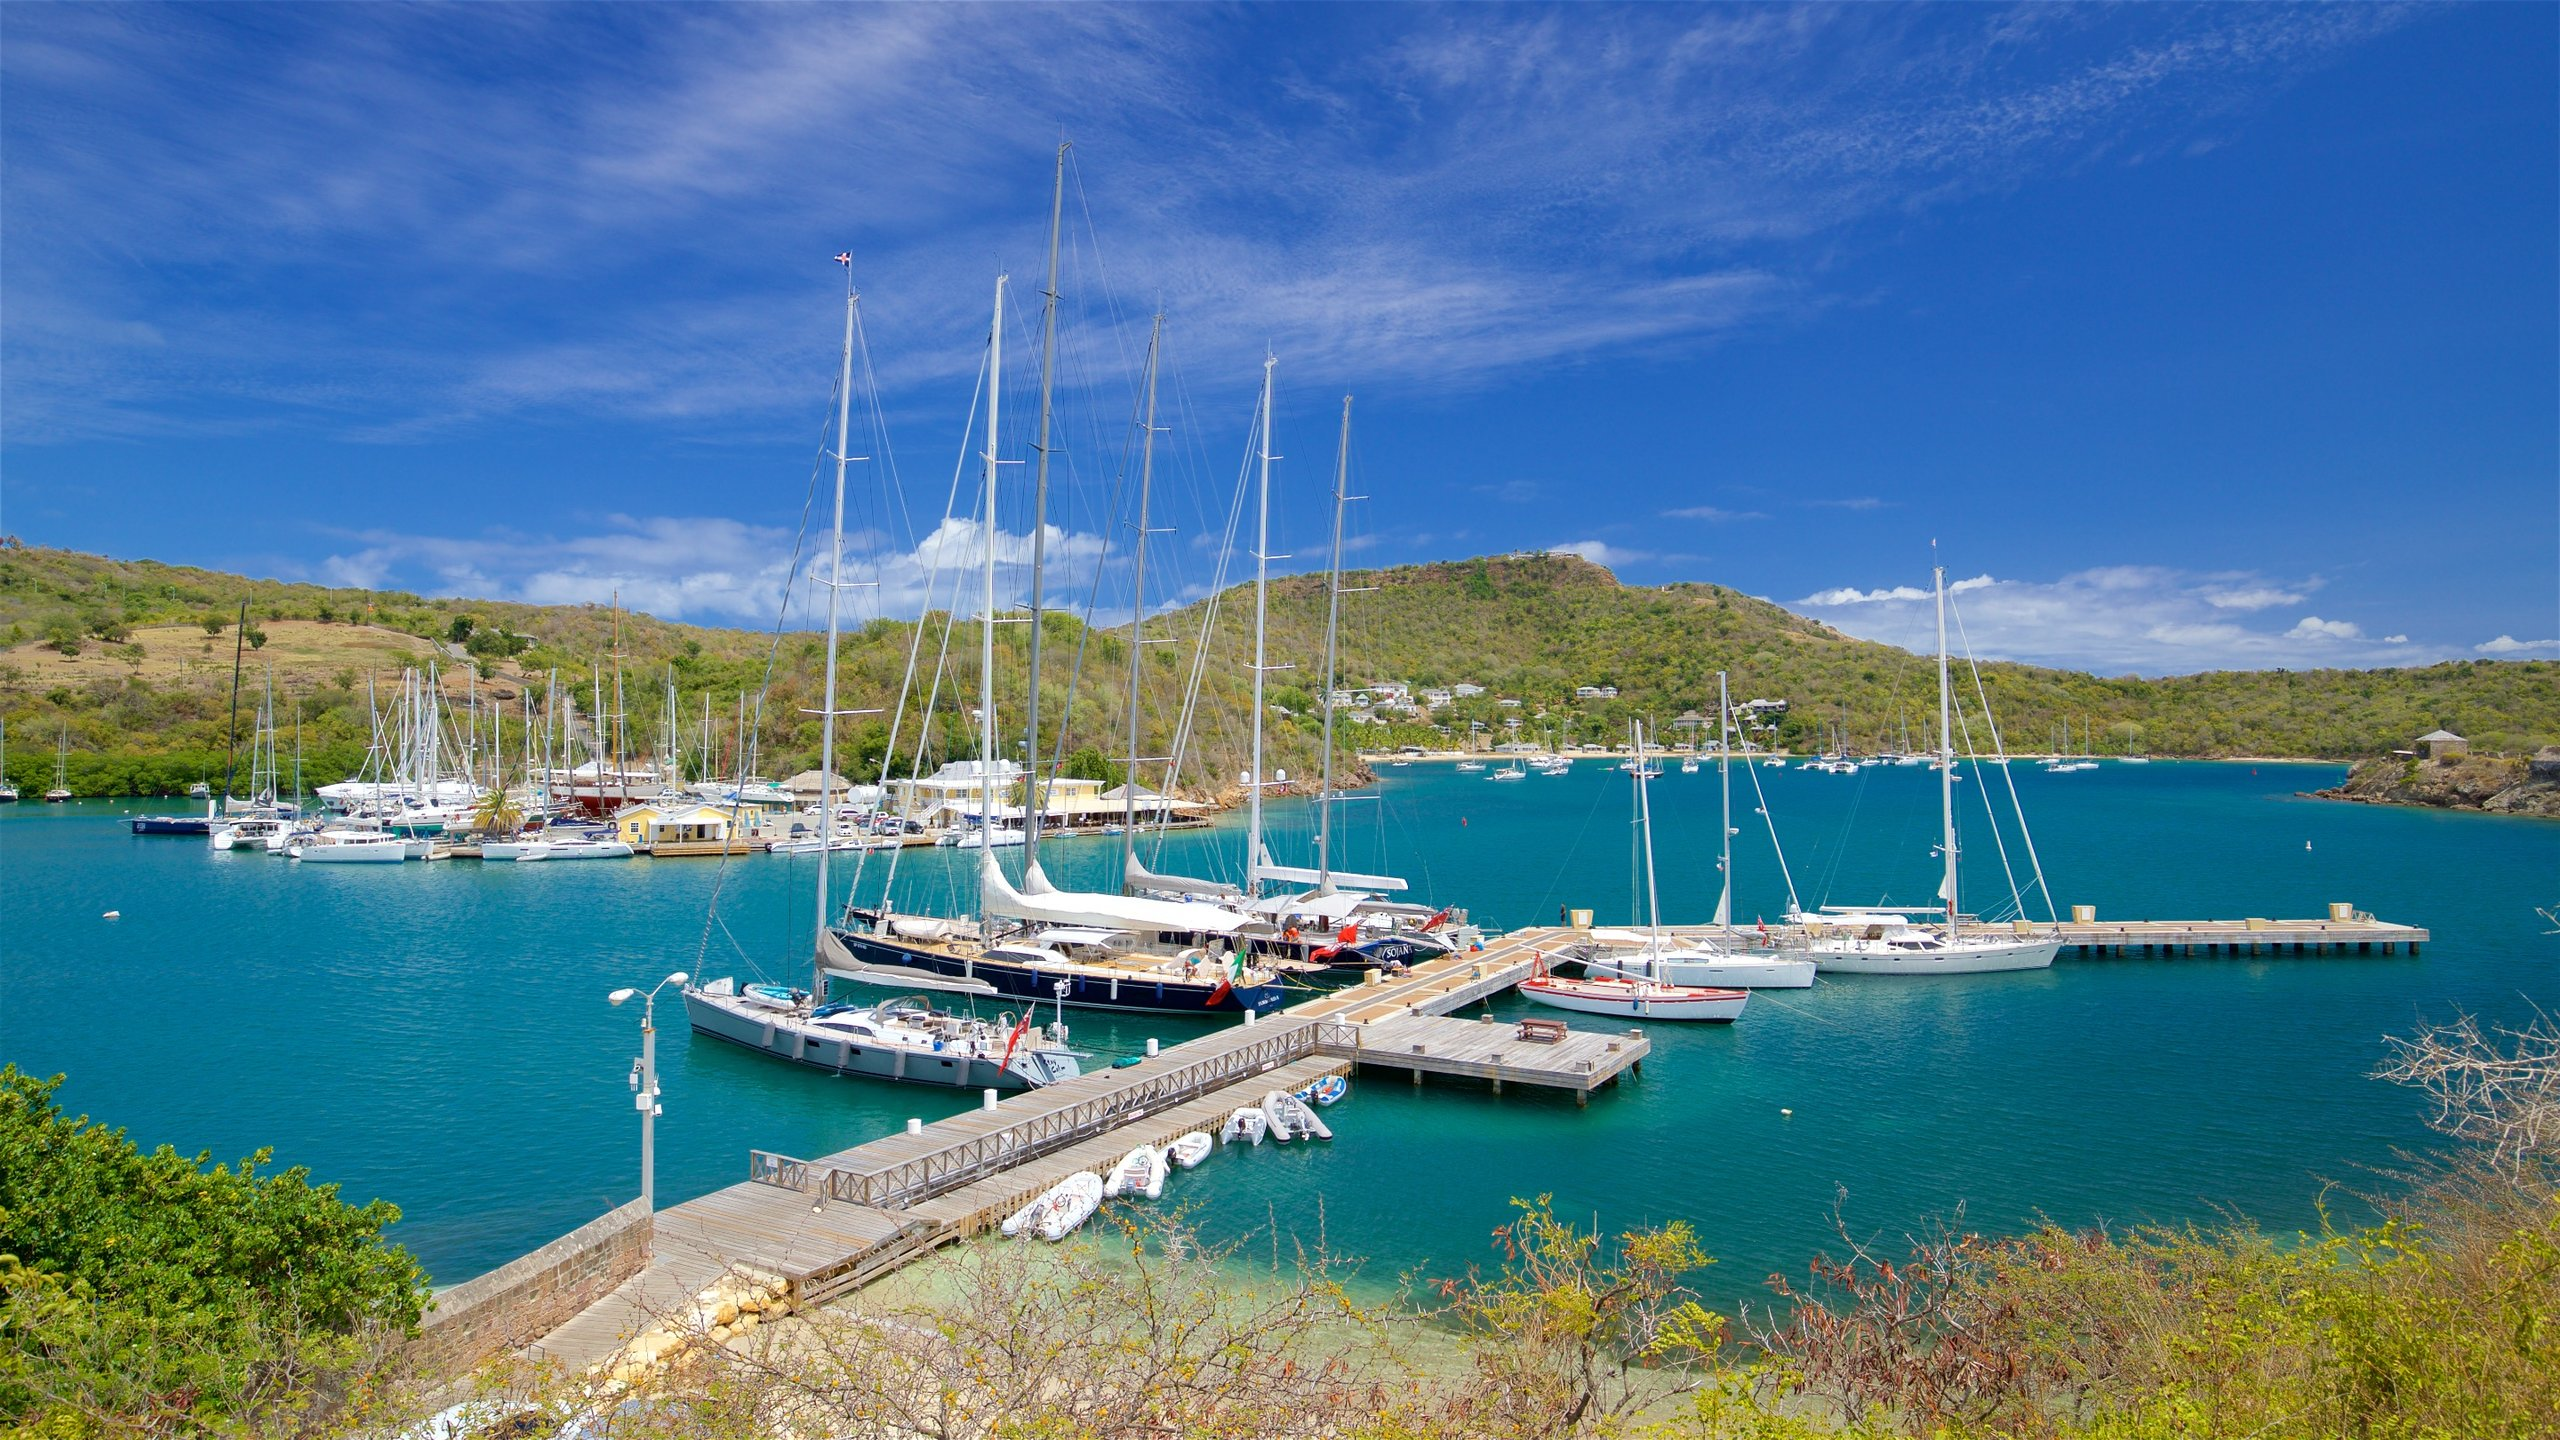 Nelson's Dockyard, English Harbour, Saint Paul, Antigua and Barbuda